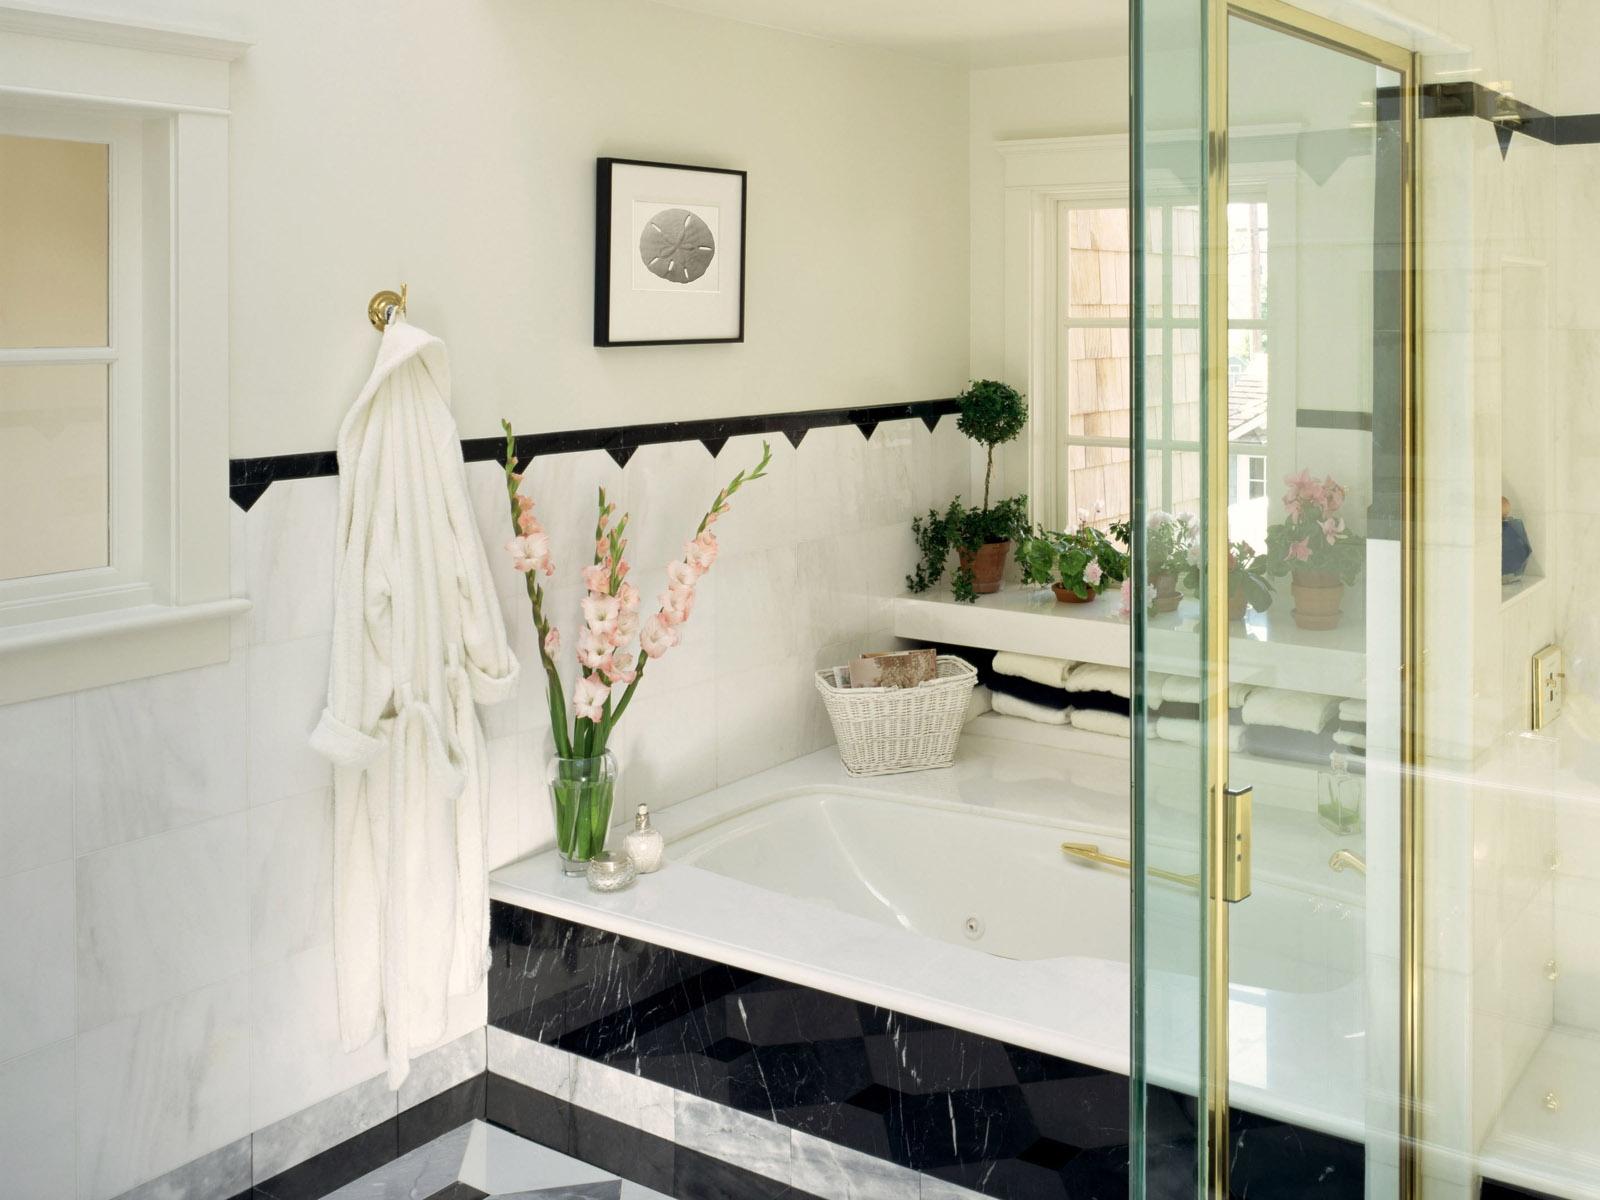 fondos de pantalla : habitación, bañera, diseño de interiores